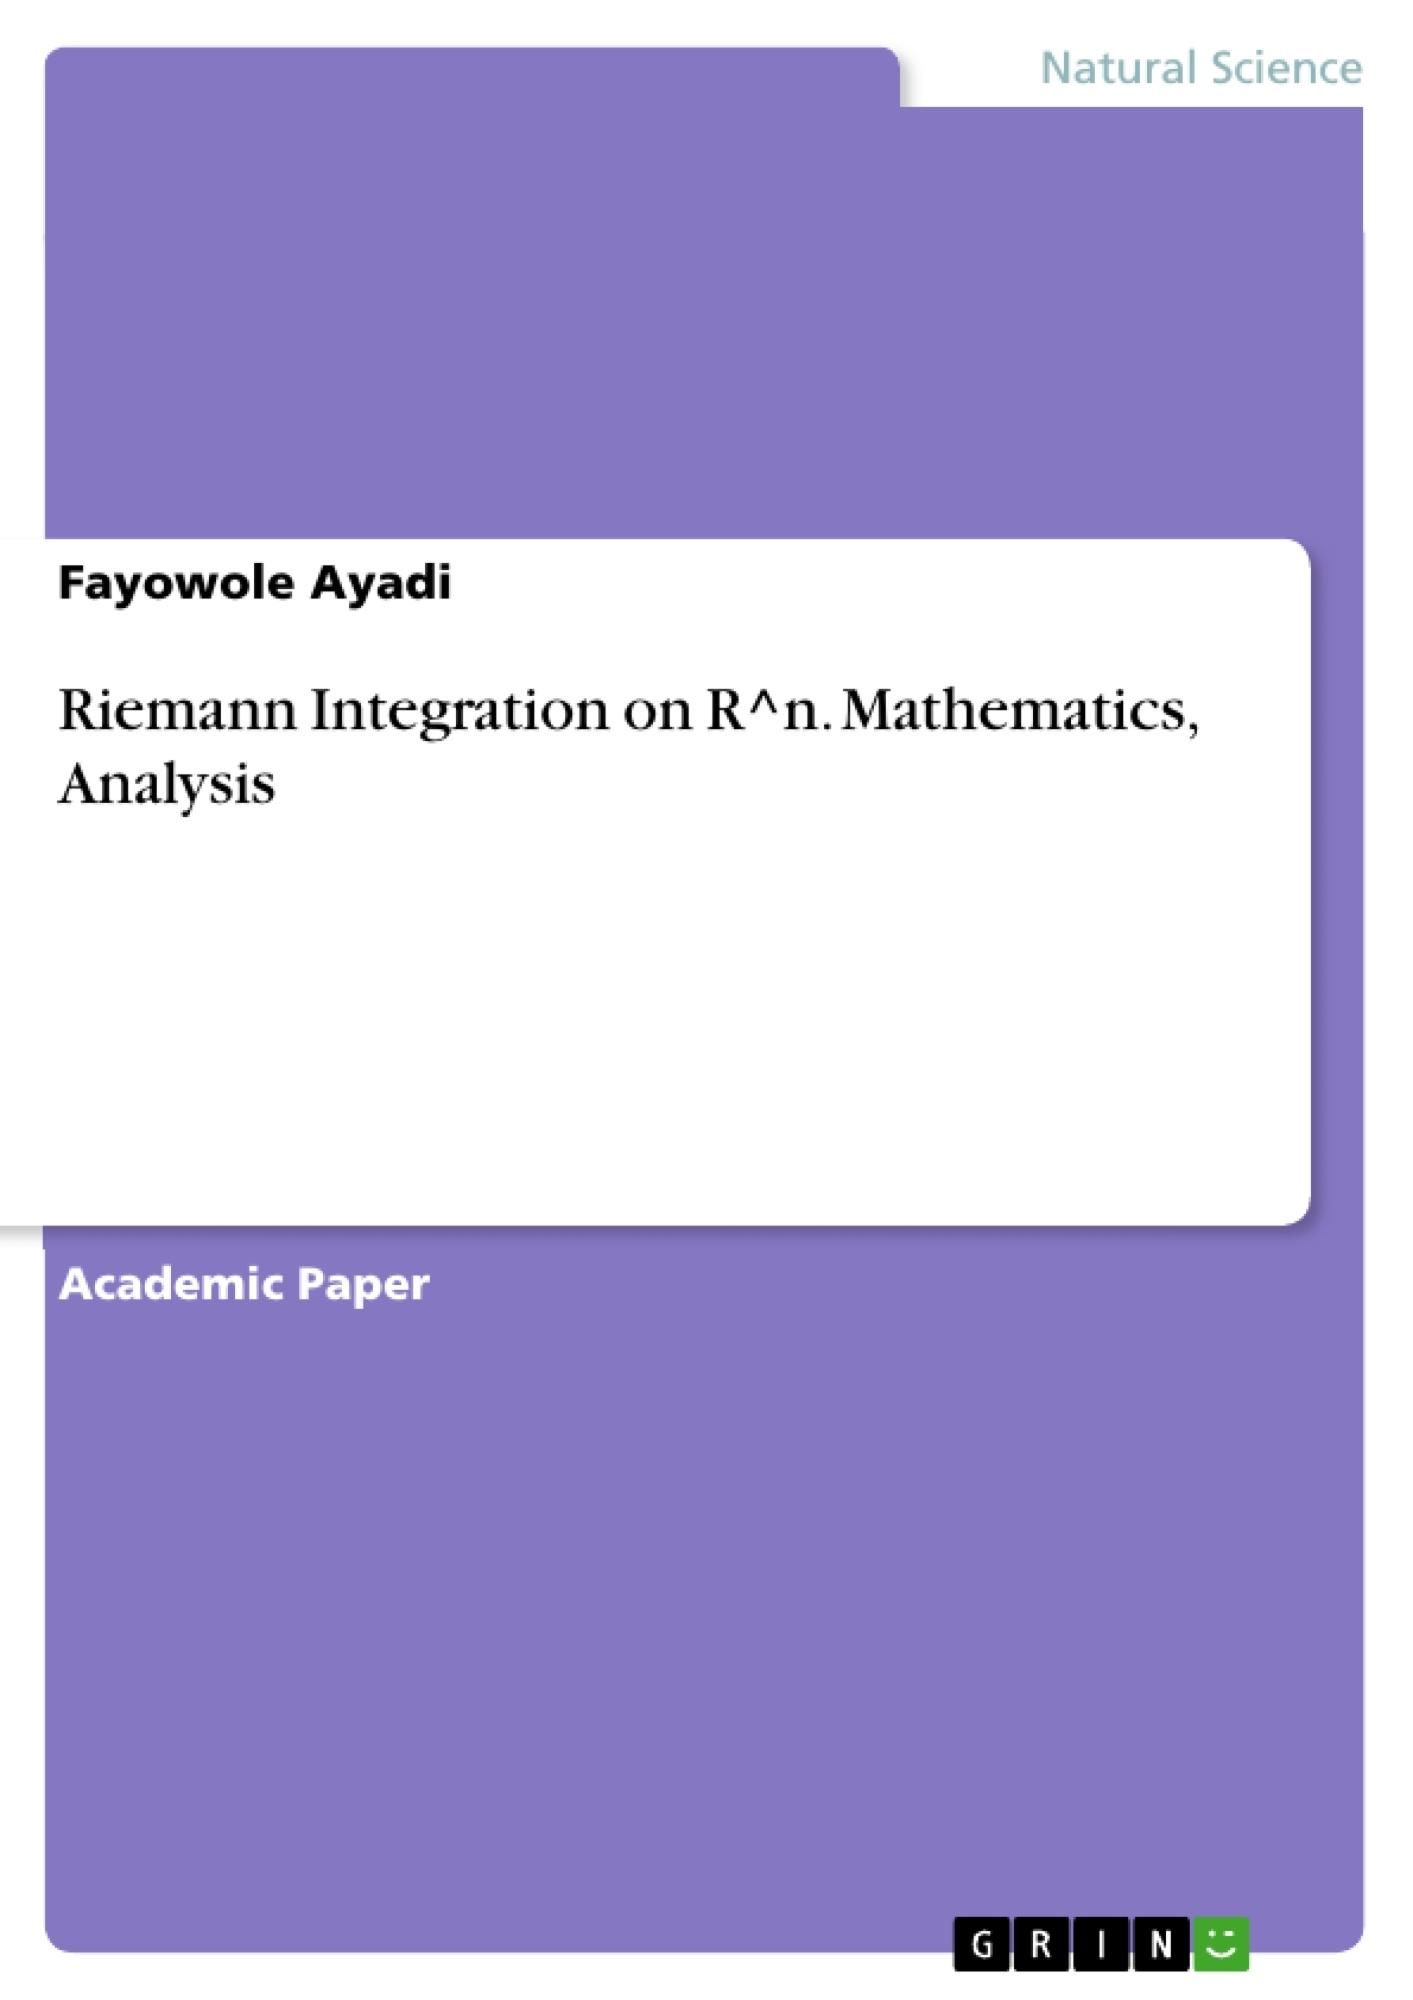 Title: Riemann Integration on R^n. Mathematics, Analysis